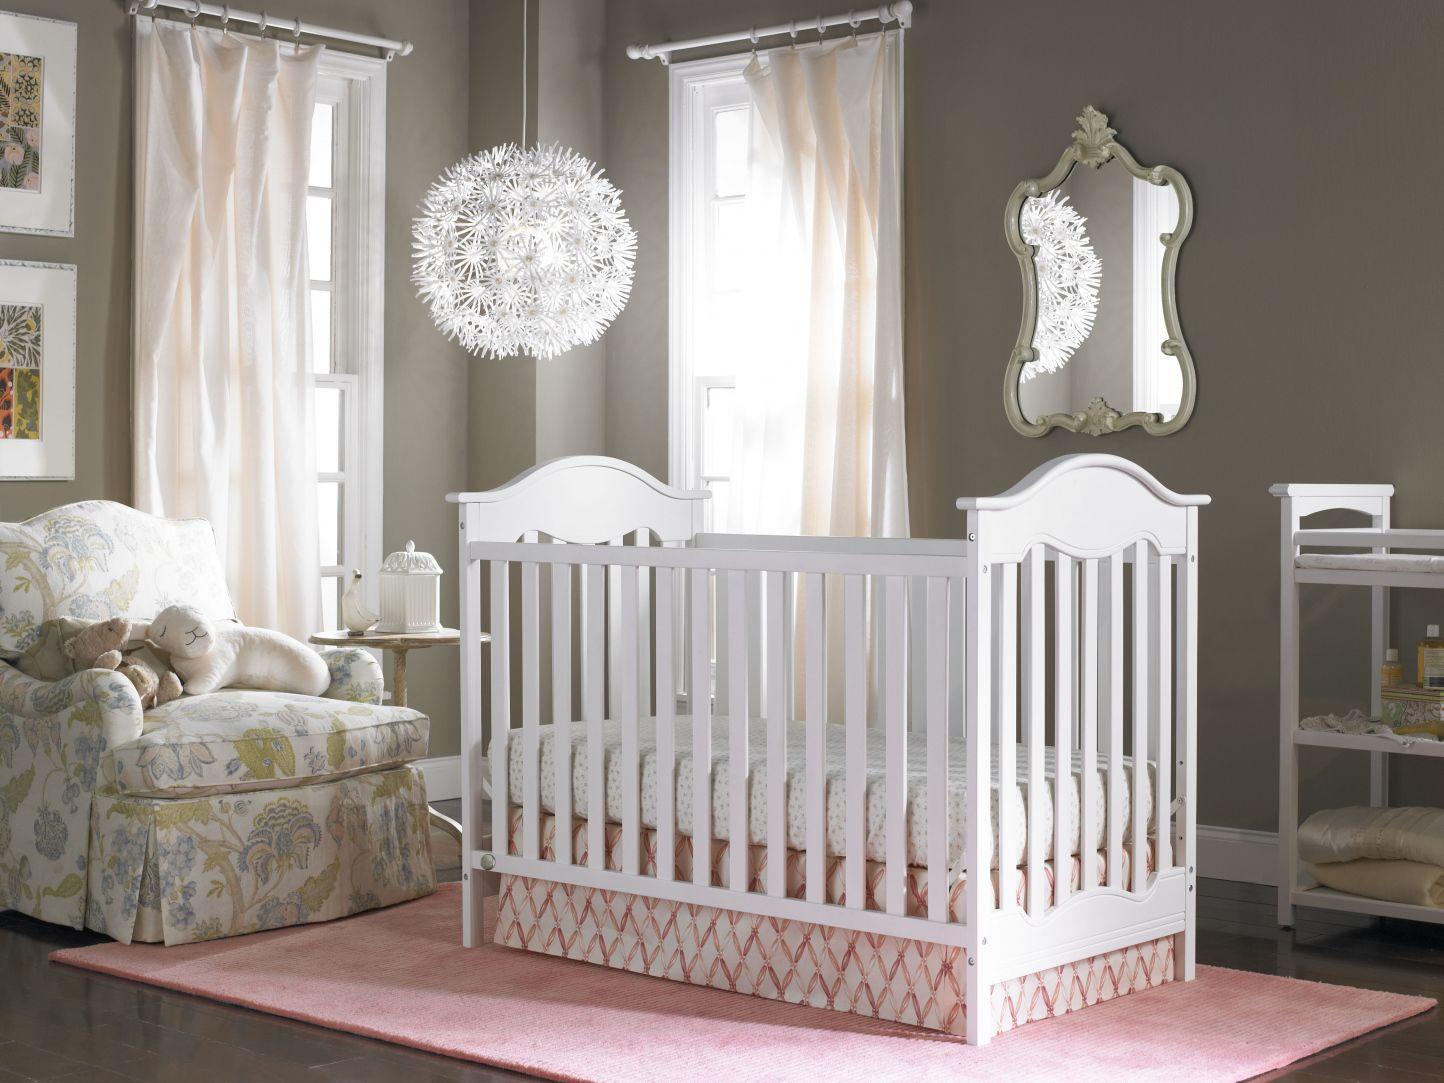 elegant baby furniture. Plain Furniture Elegant Baby Cribs Furniture  Lowes Paint Colors Interior Check More At  Httpwwwchulaniphotographycomelegantbabycribsfurniture Inside E